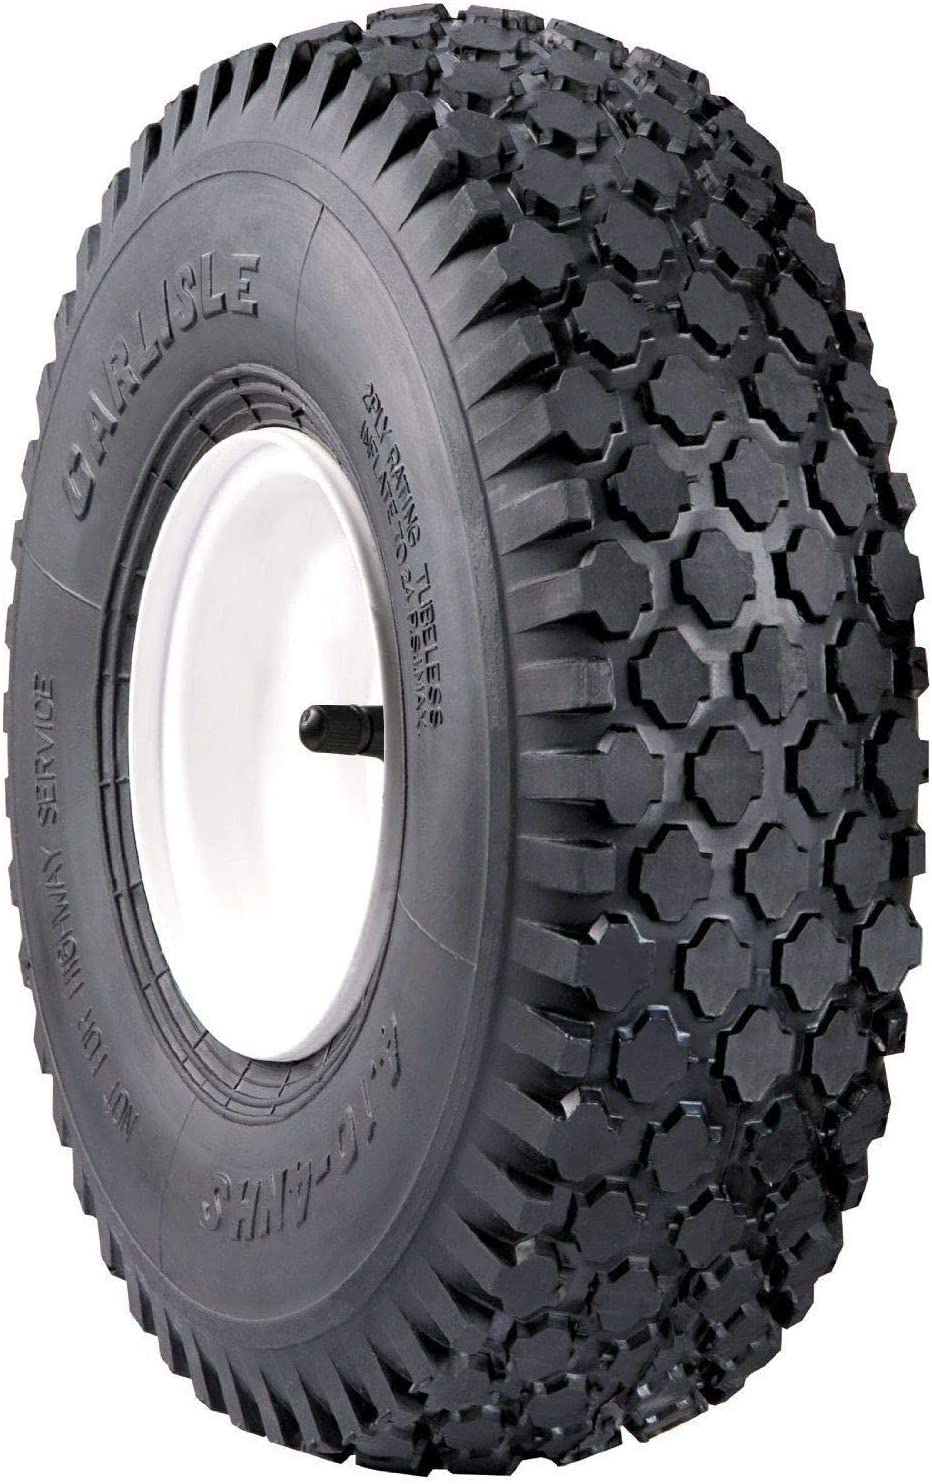 Carlisle Snow Hog Bias Tire 4.1-6